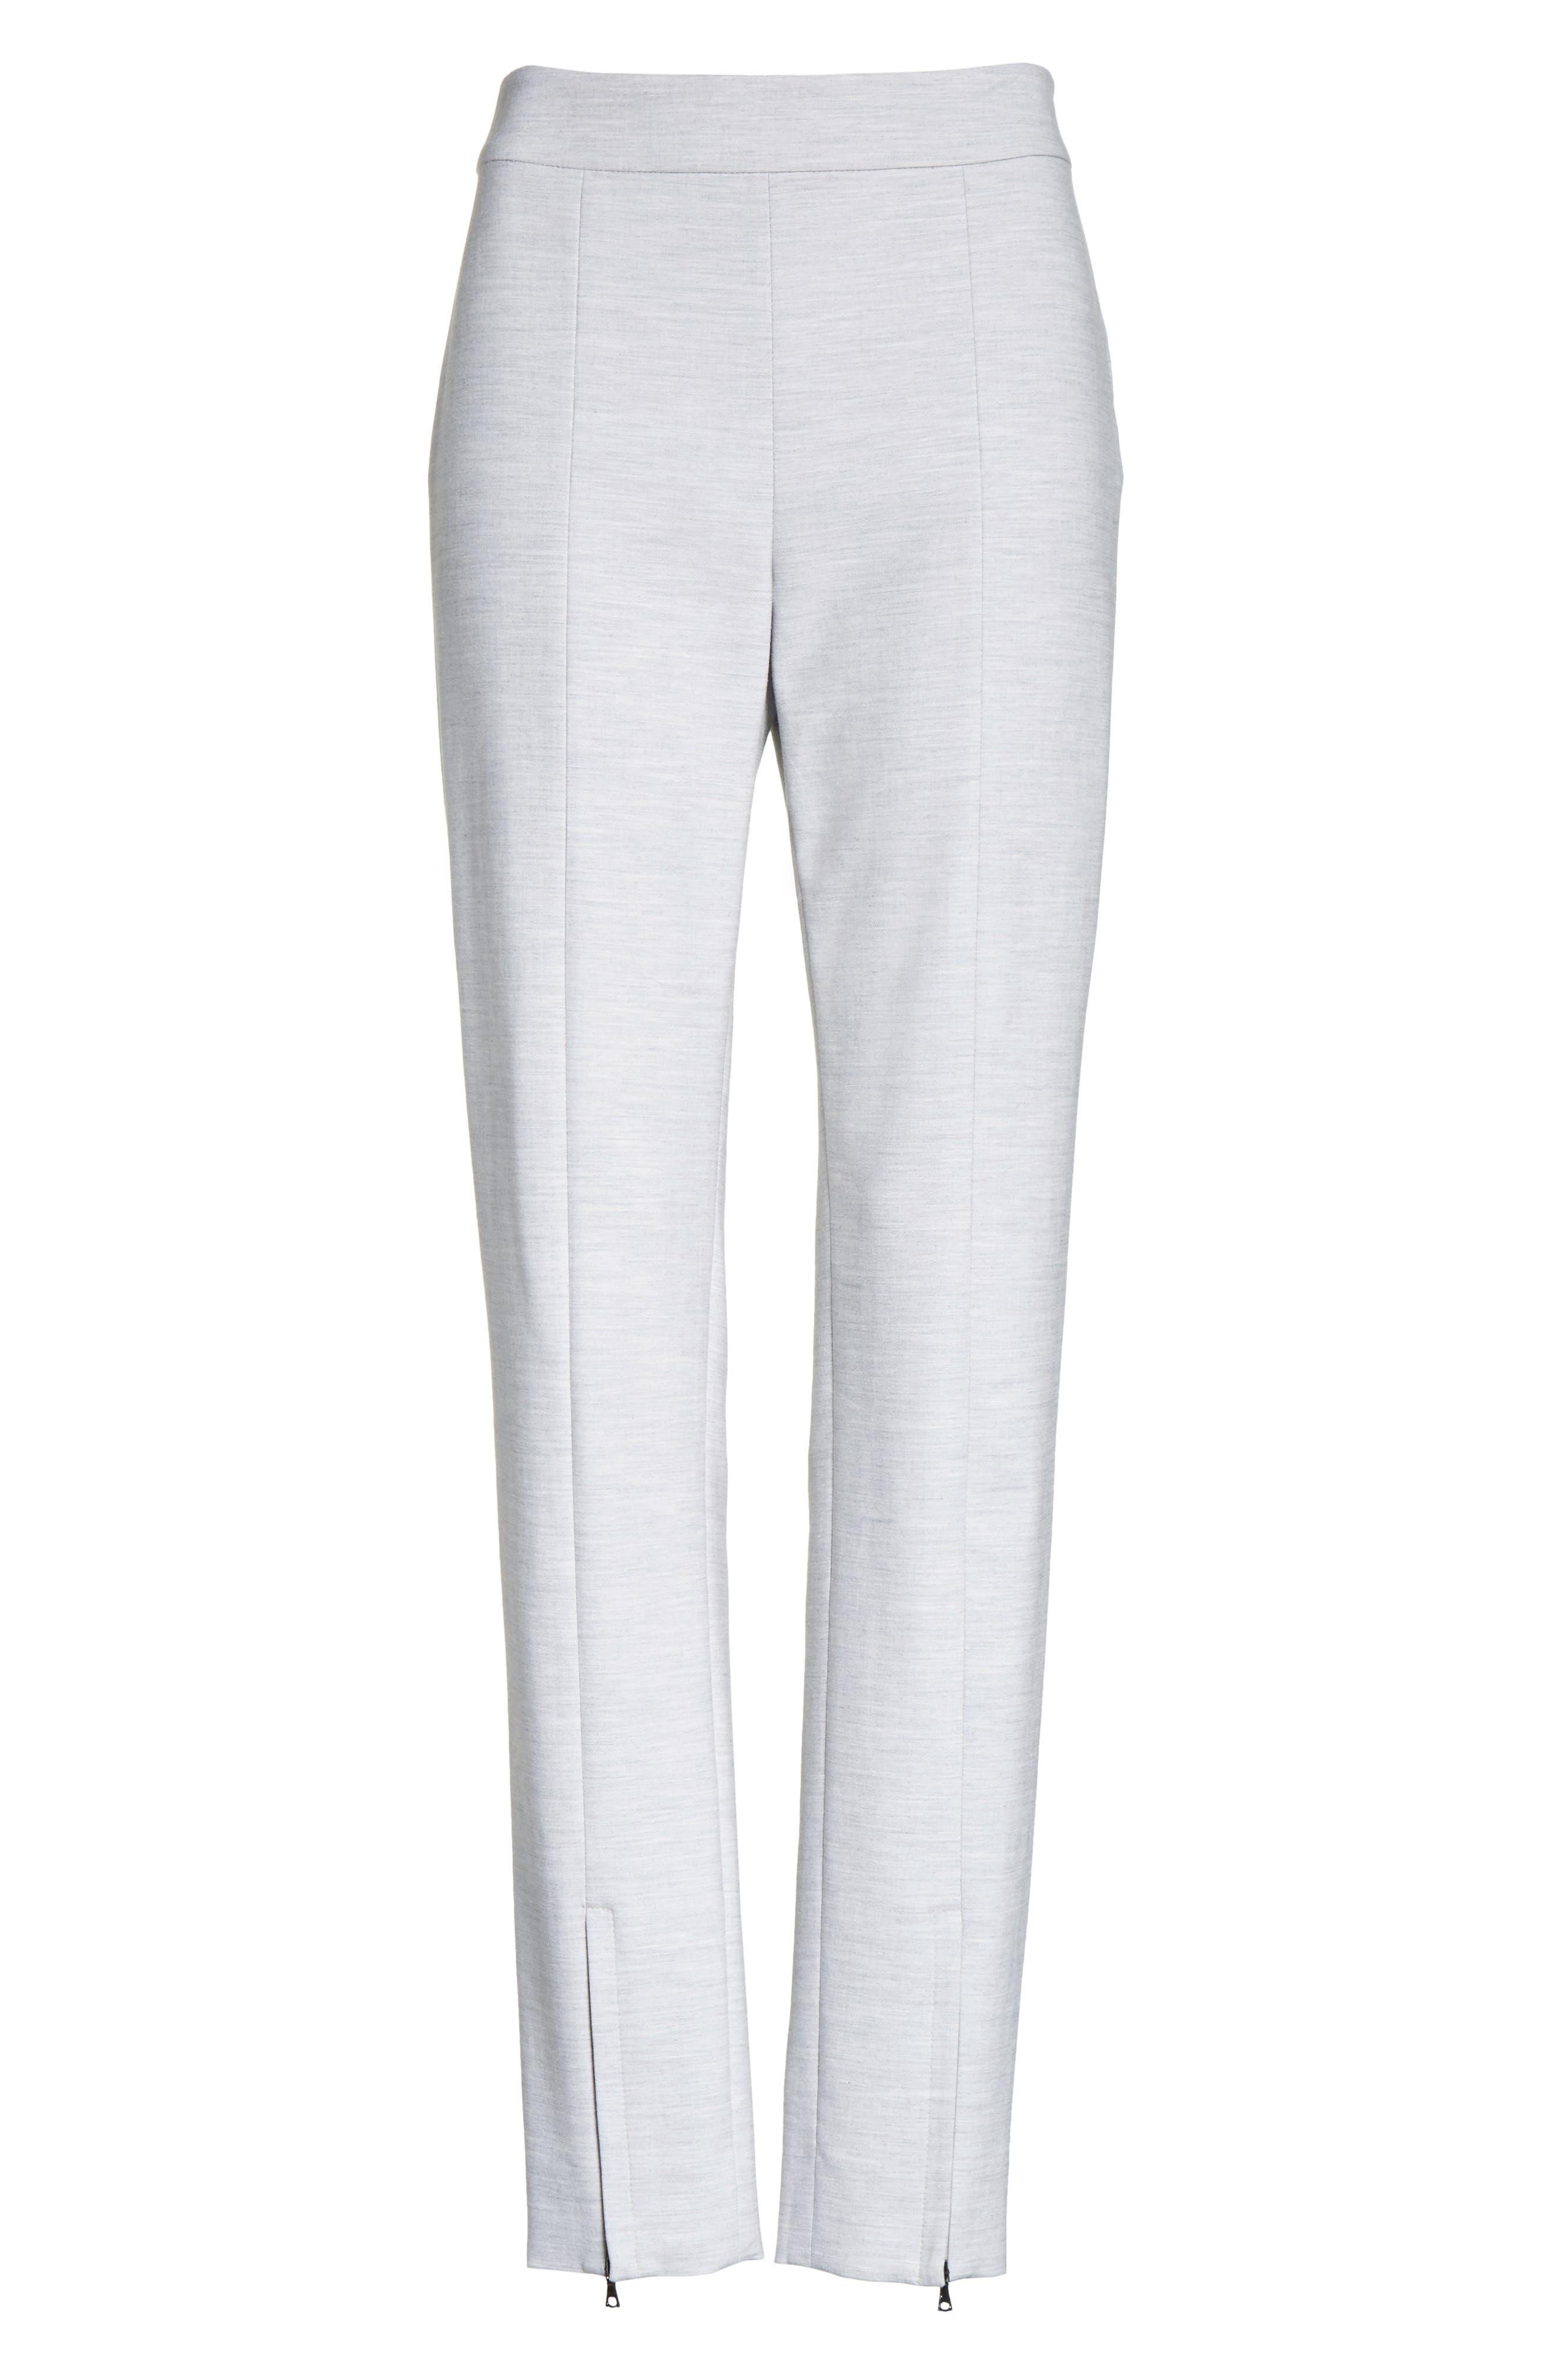 Summer Bella Double Weave Pants,                             Alternate thumbnail 6, color,                             060